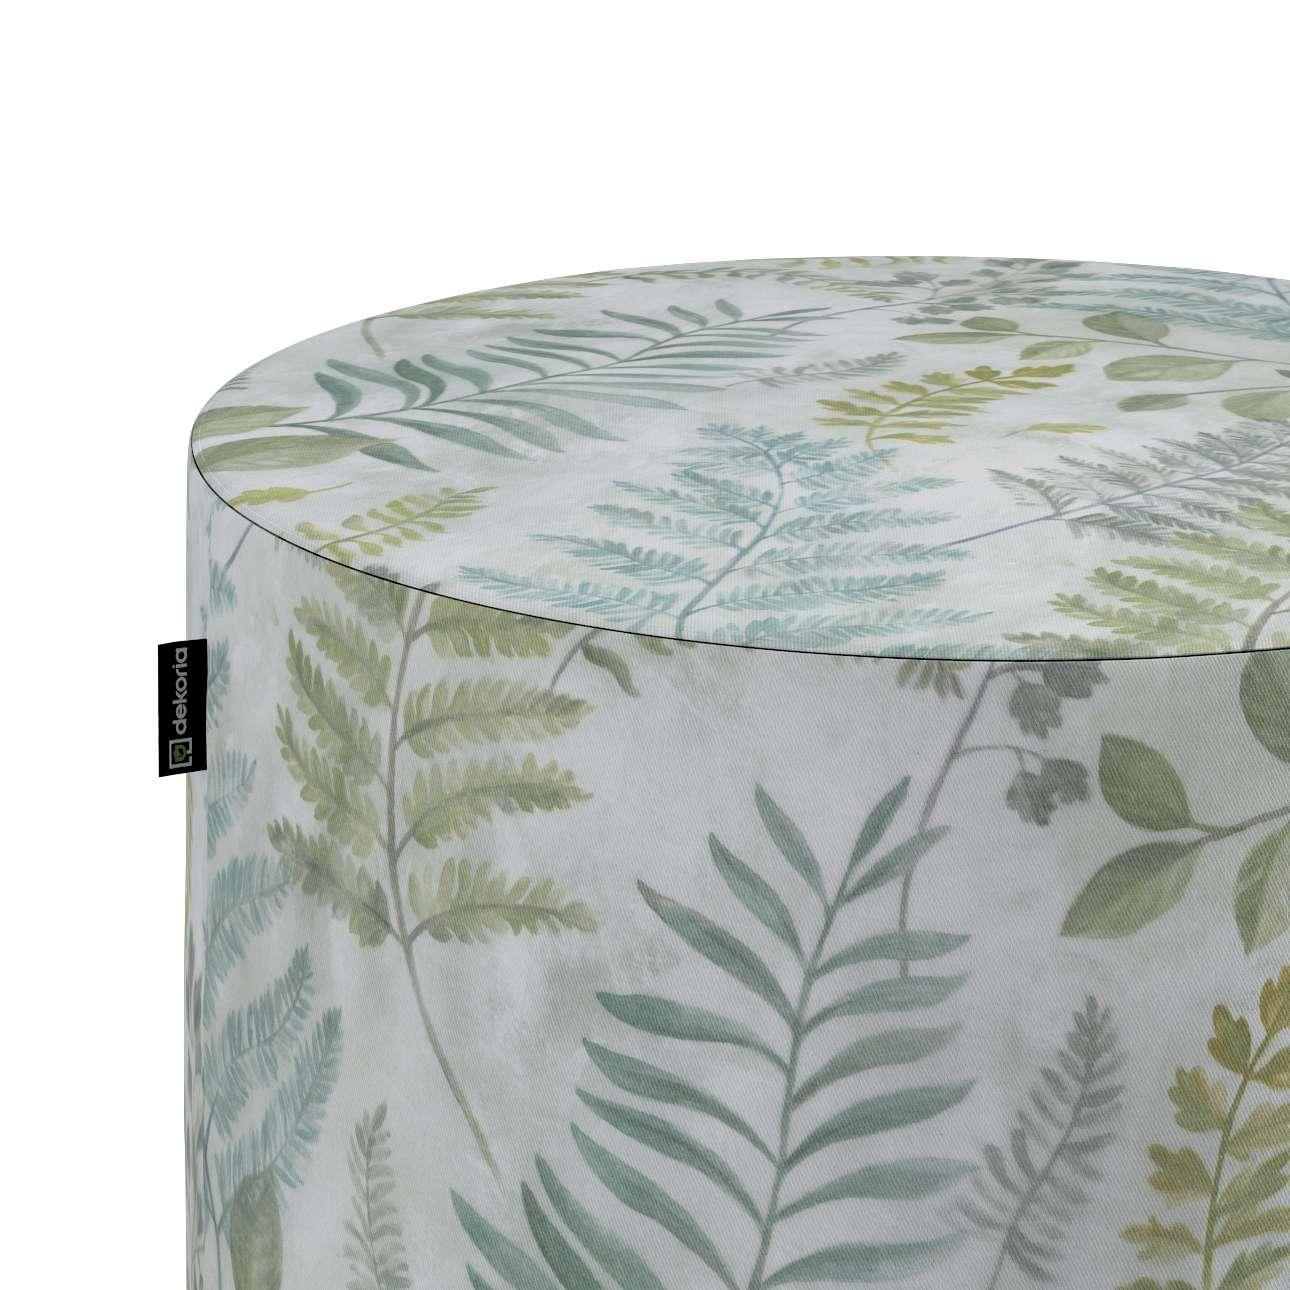 Pouf Barrel von der Kollektion Tropical Island, Stoff: 142-46